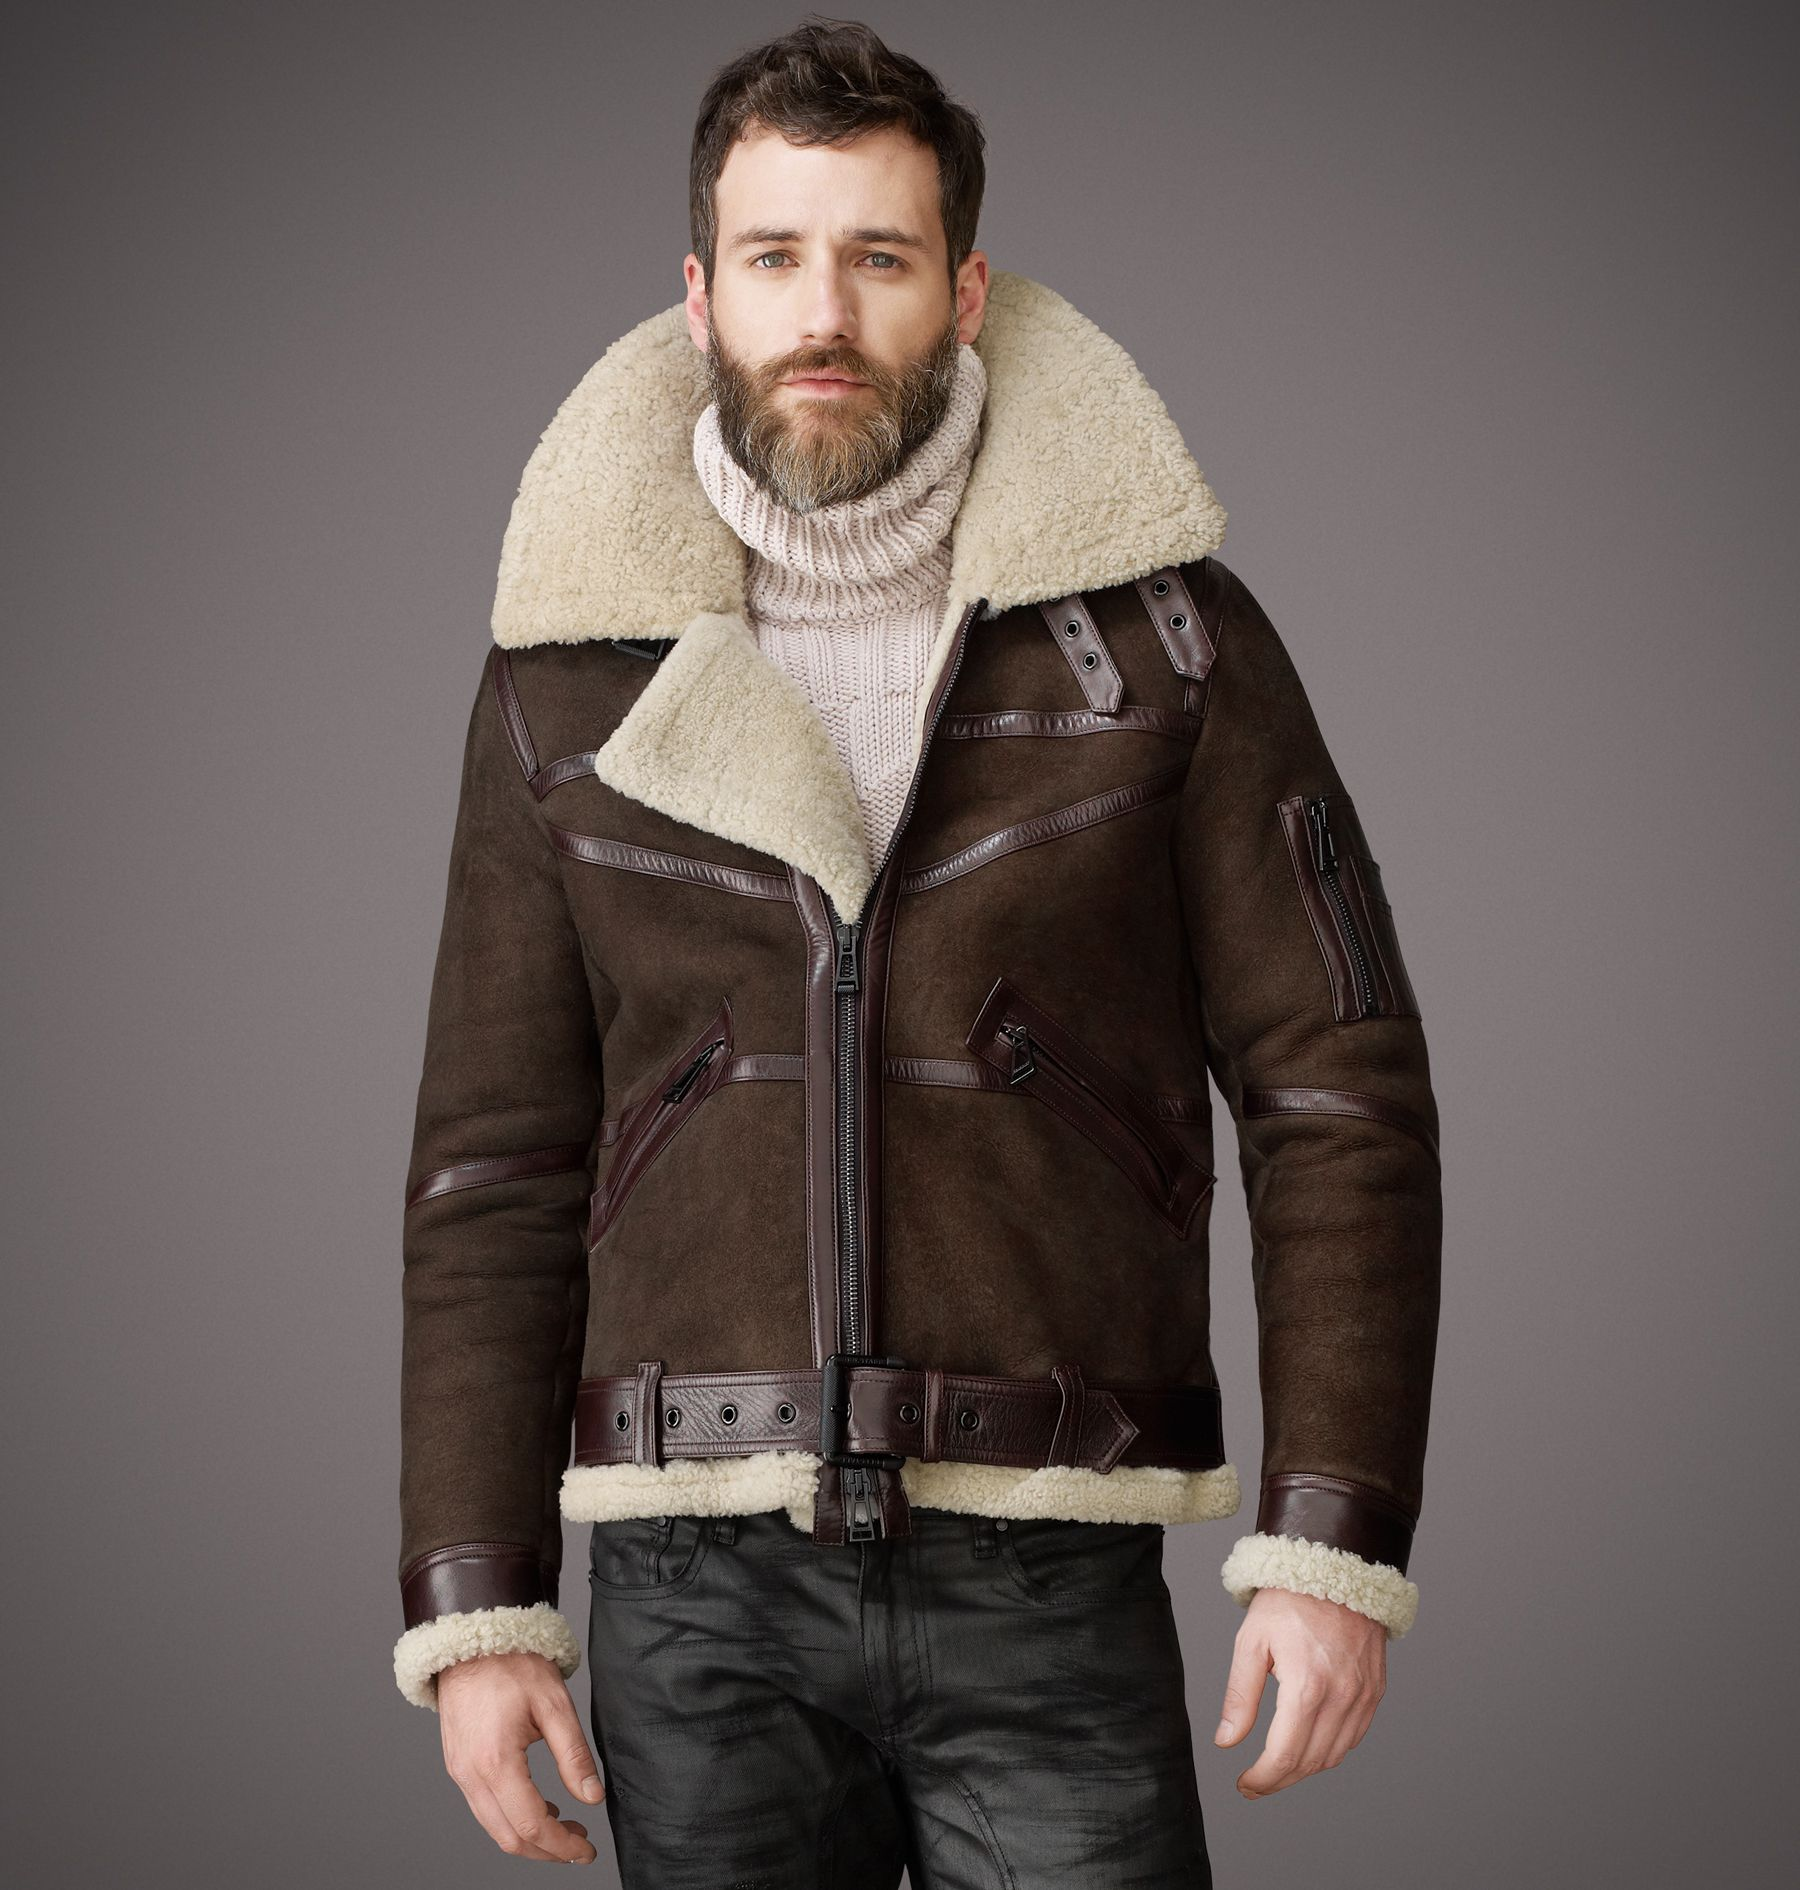 Belstaff Bridlington Jacket Shearling Jacket Made in Italy